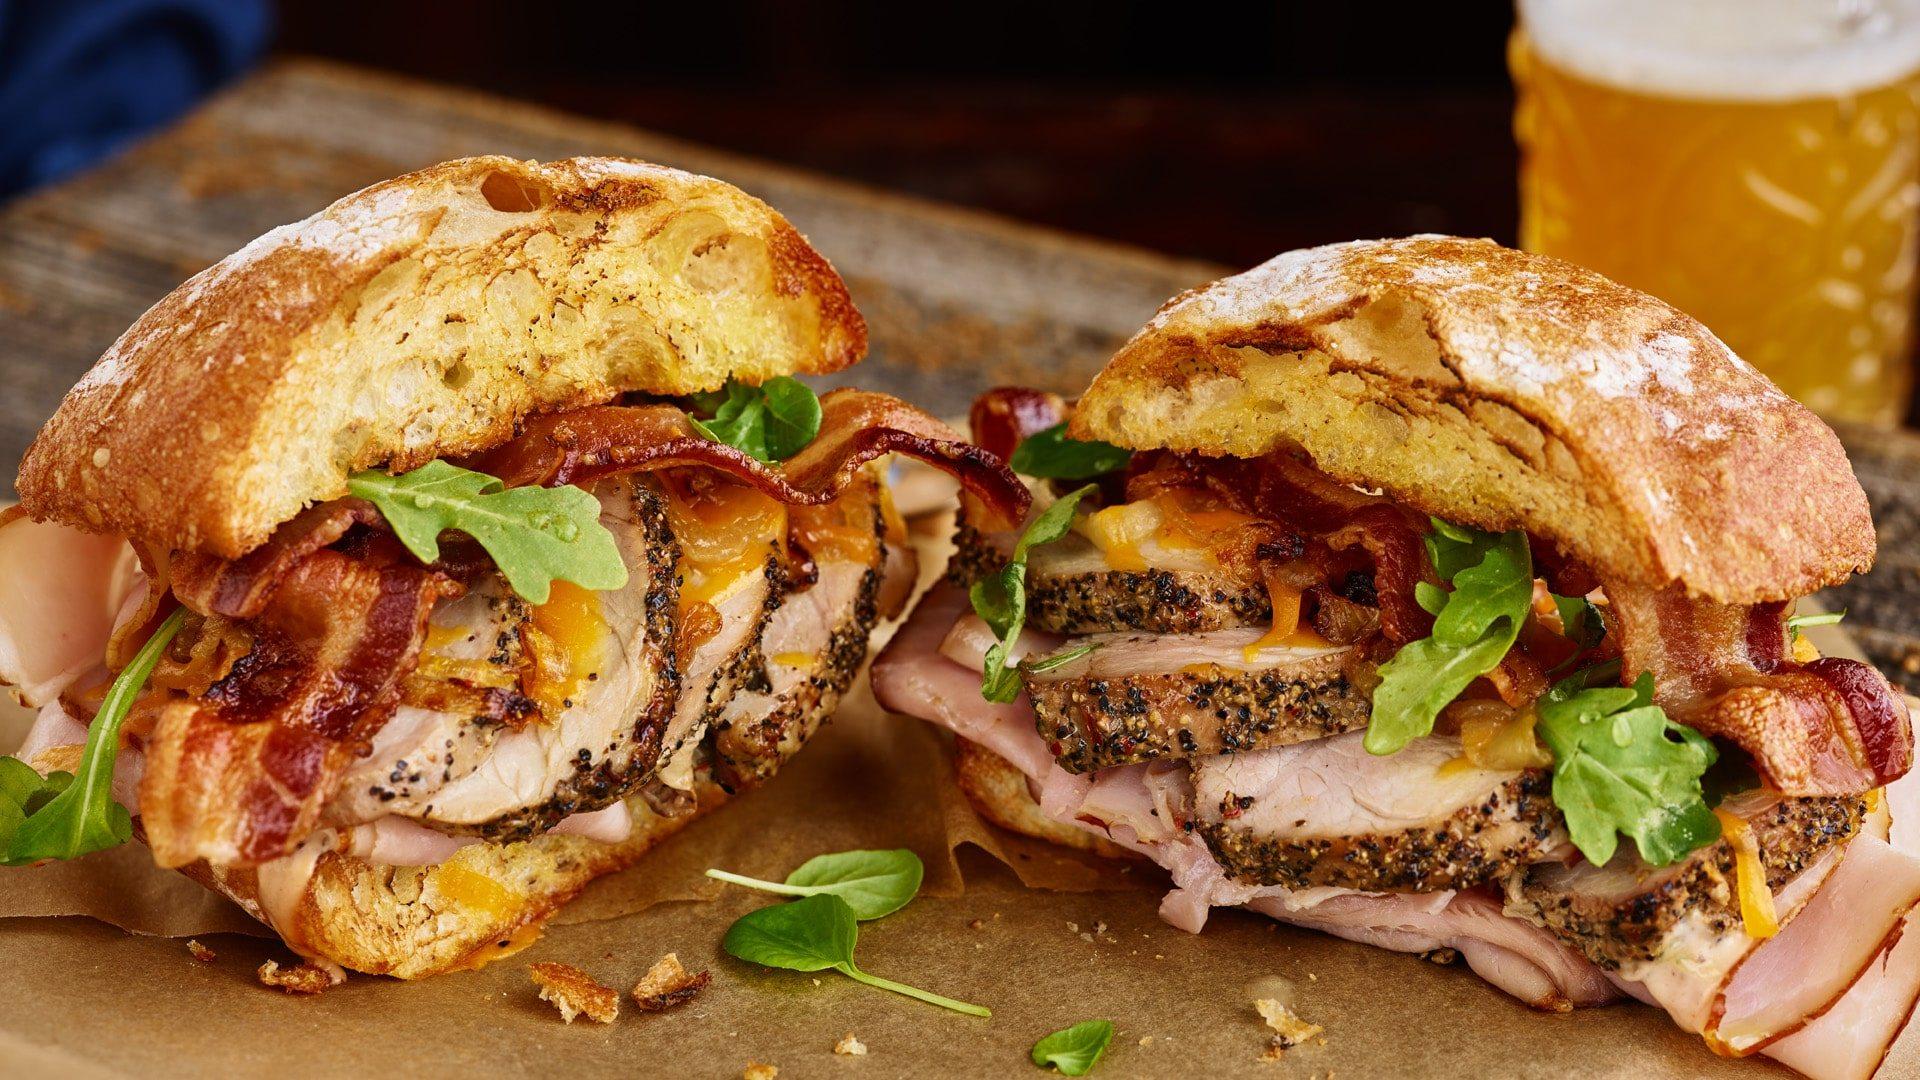 Farmland Passion for Pork - Pork Sandwich